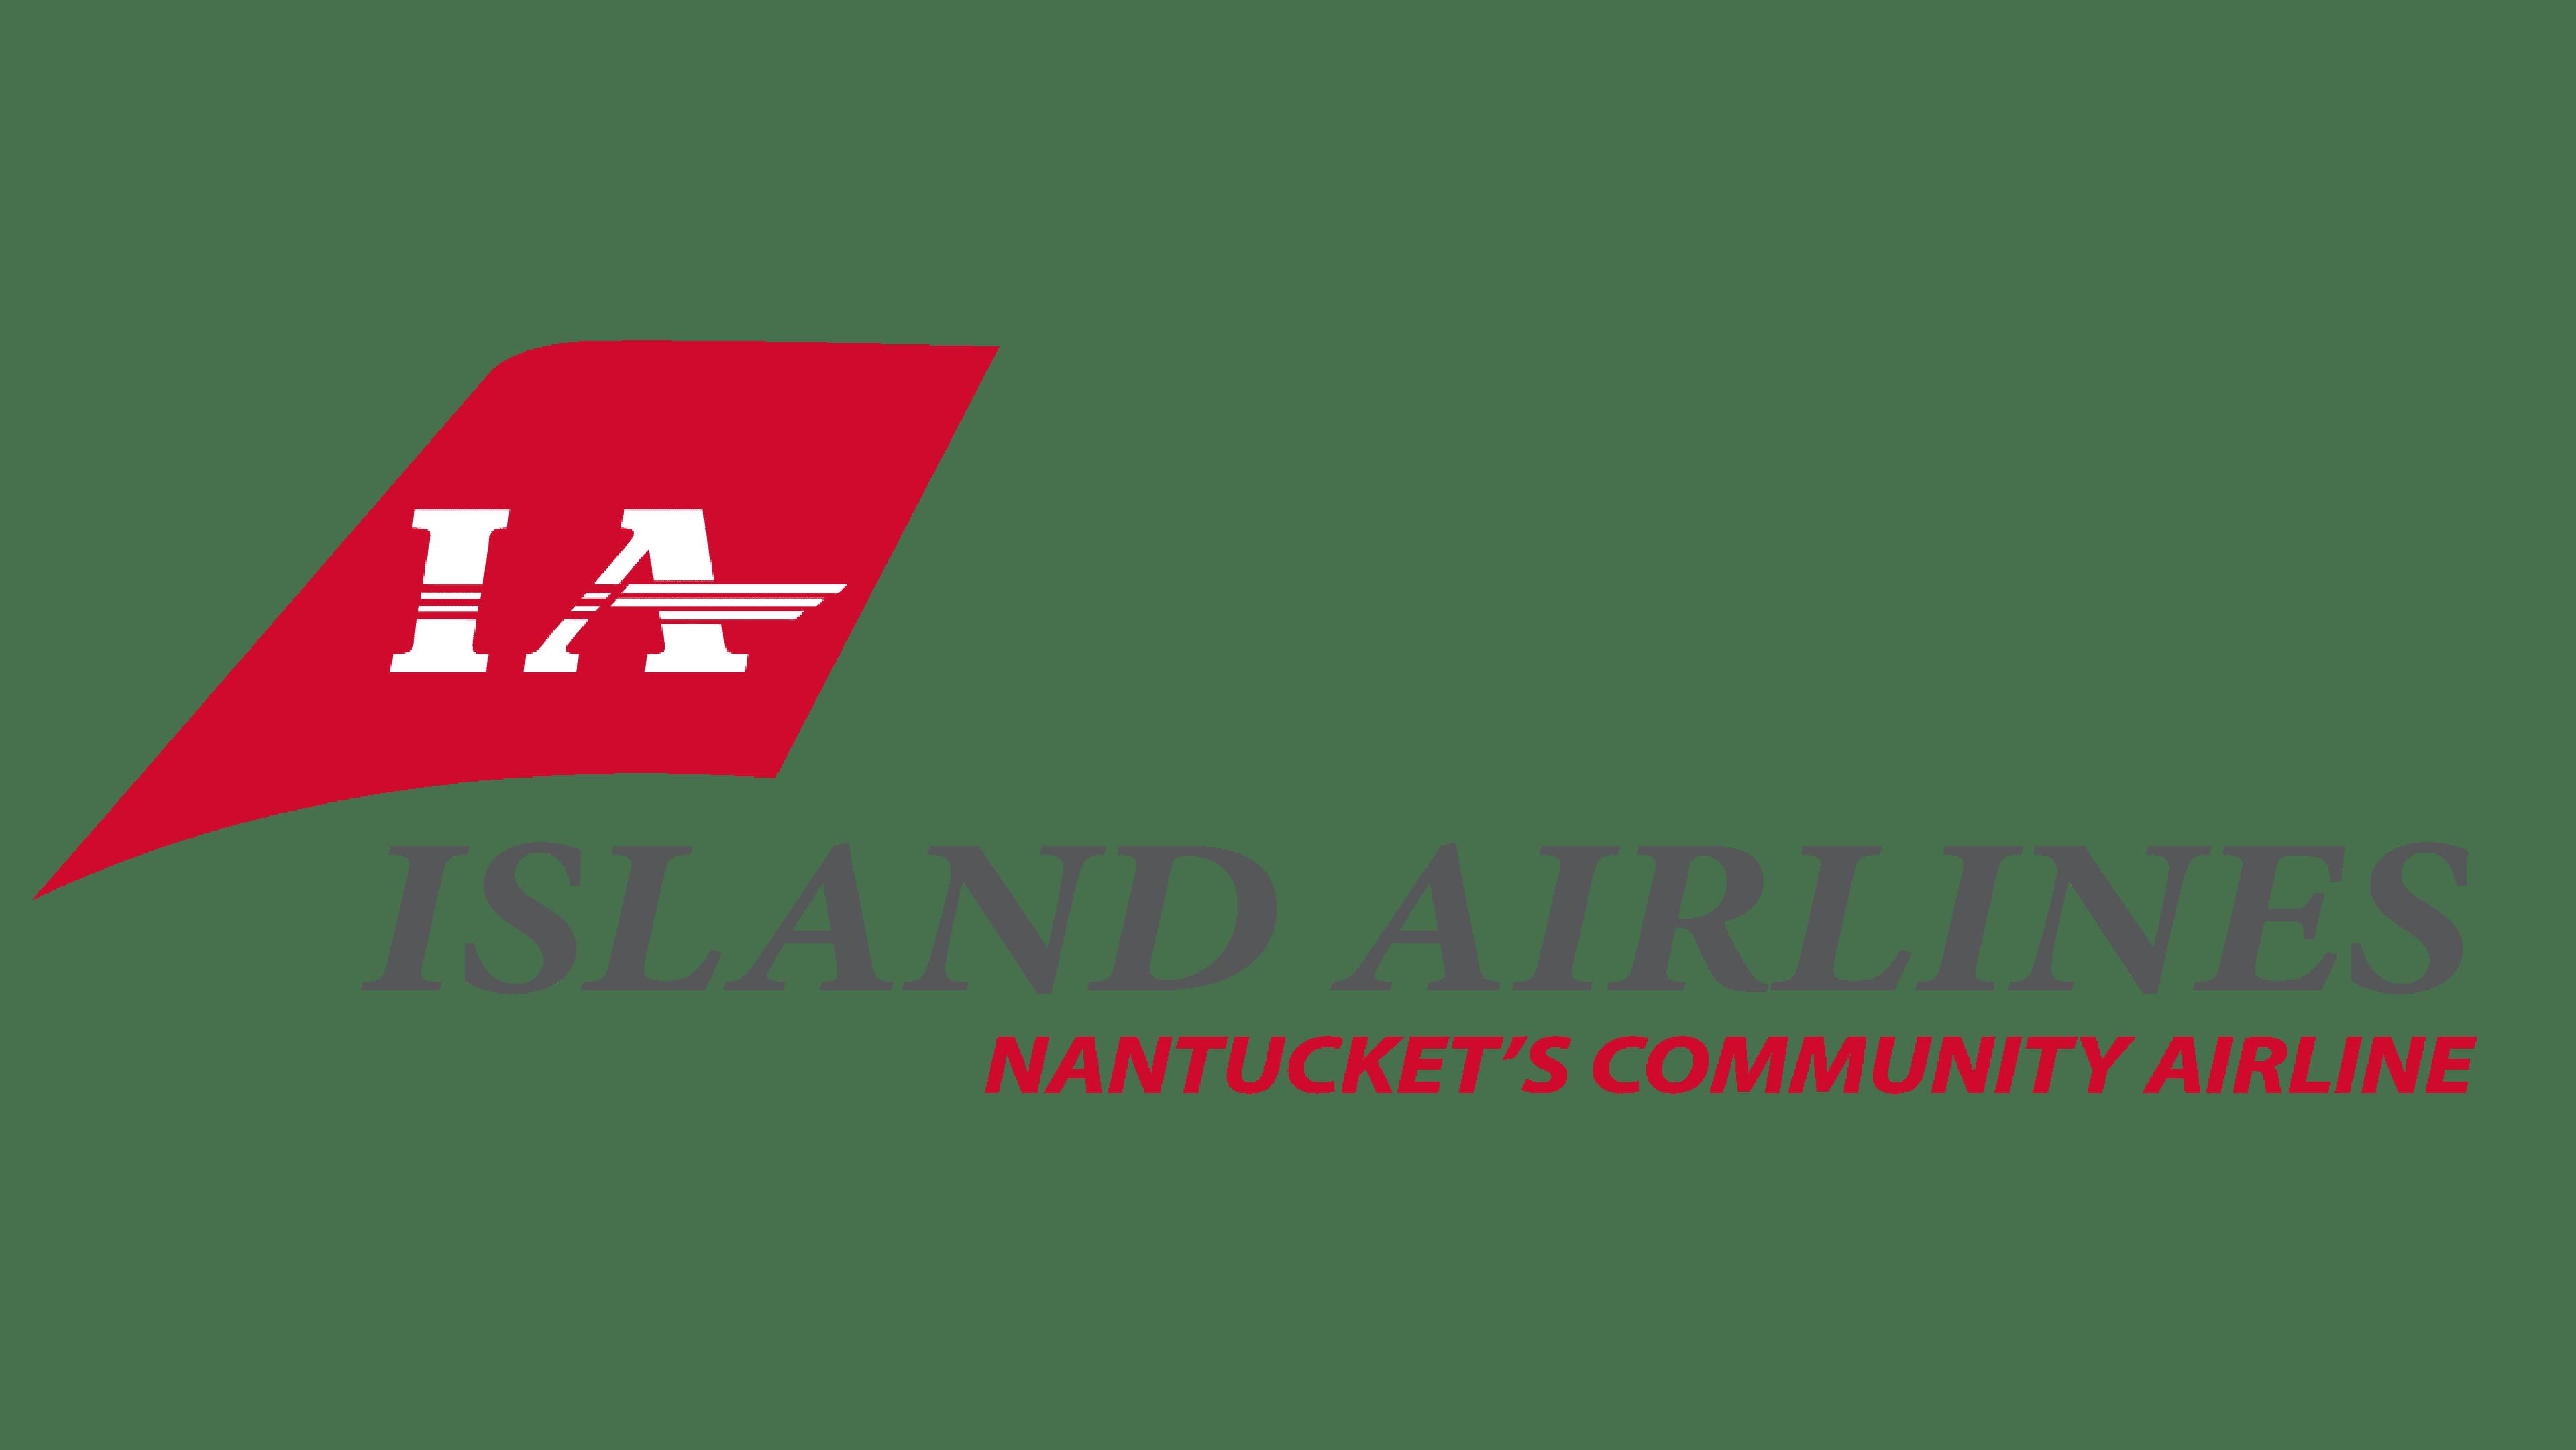 Island Airlines Logo Logo